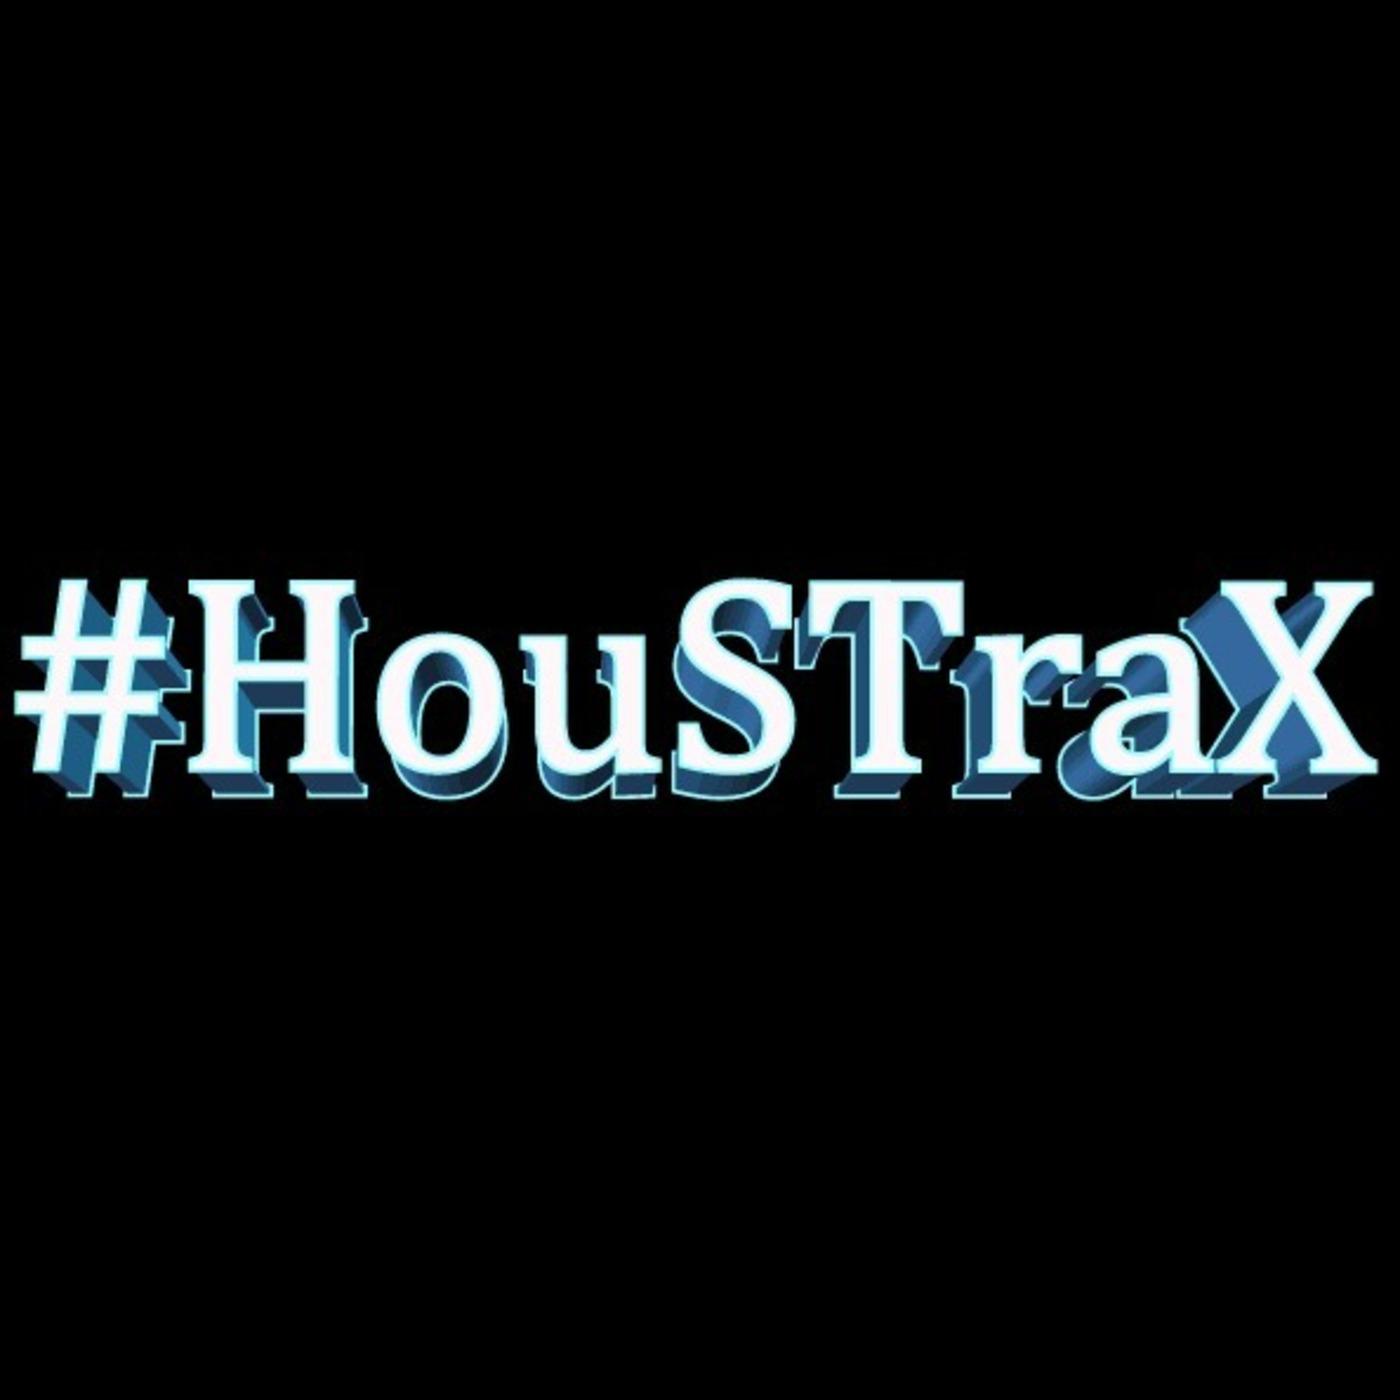 HouSTraX